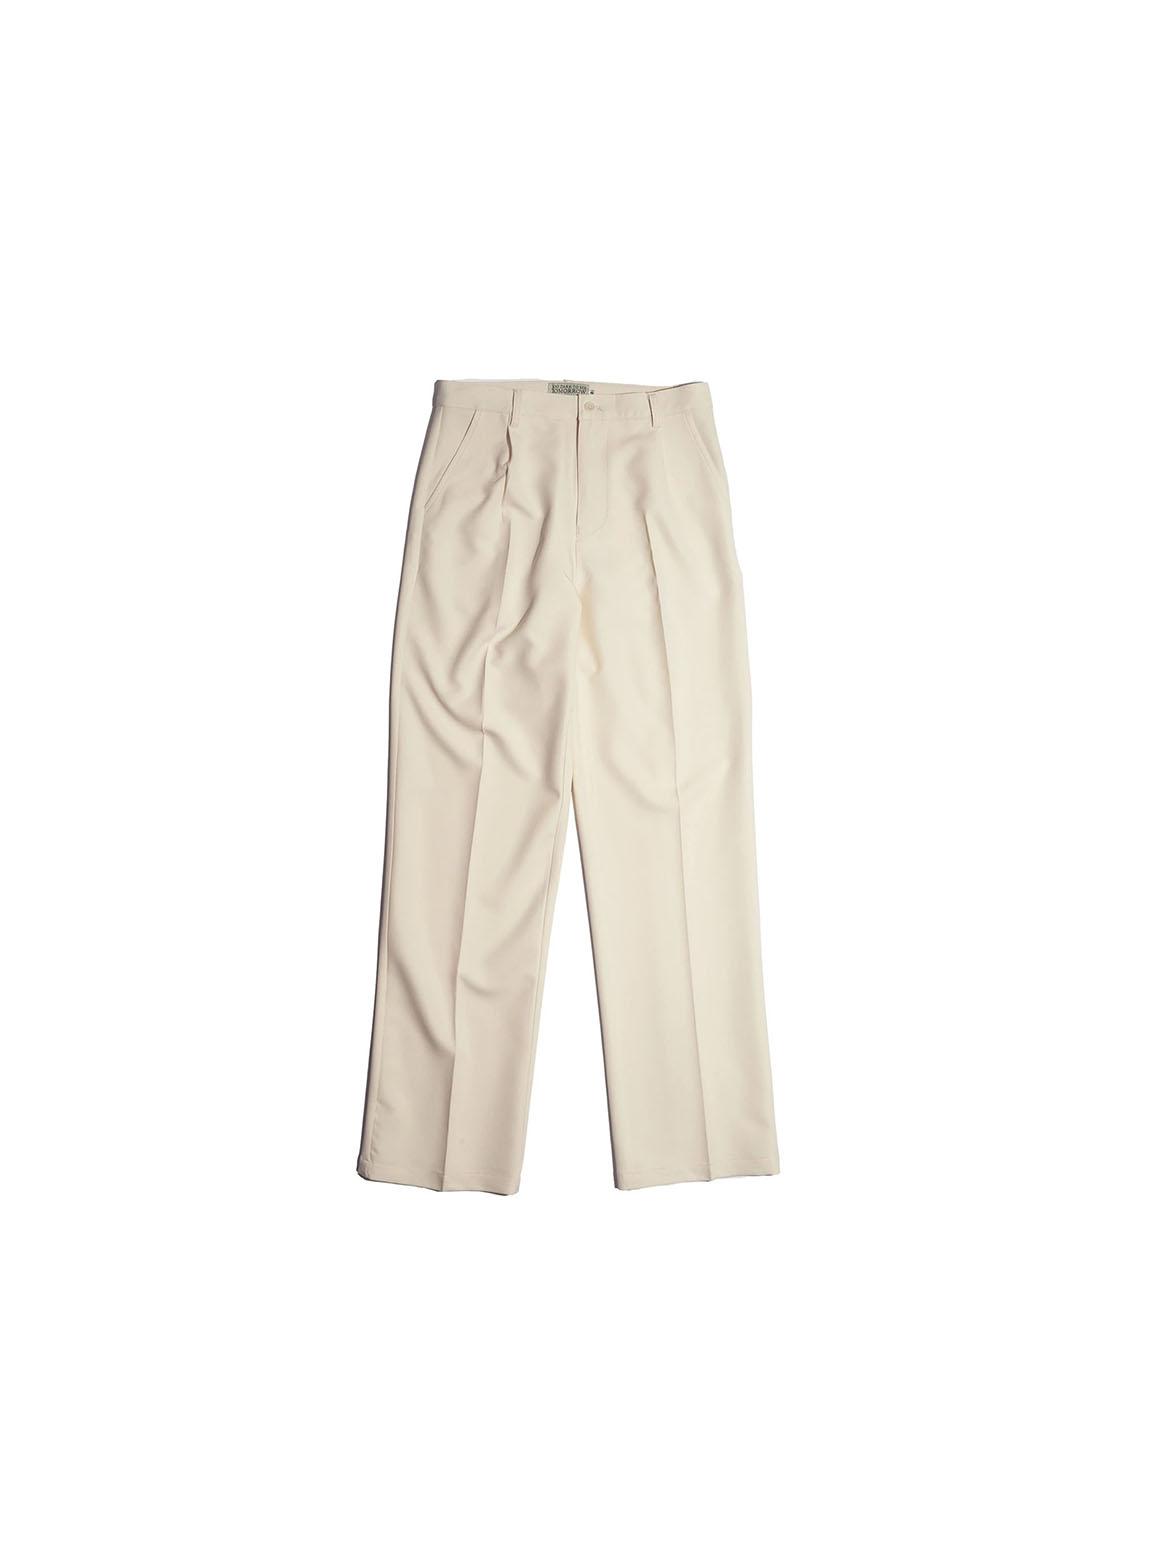 Off-white high rise trouser